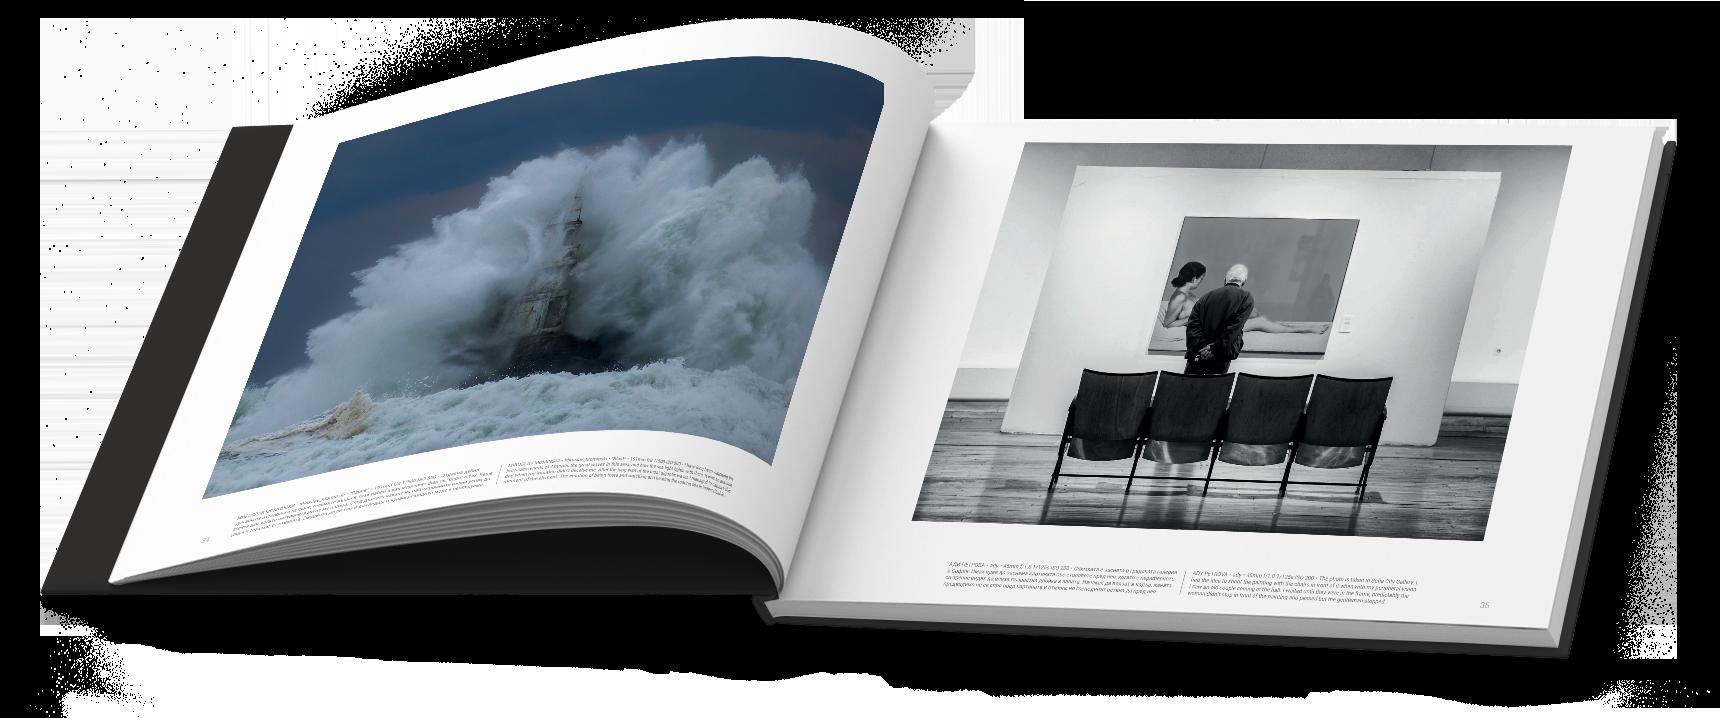 Фотографски Албум 2018 г. - Black&White &Color - страници 34-35